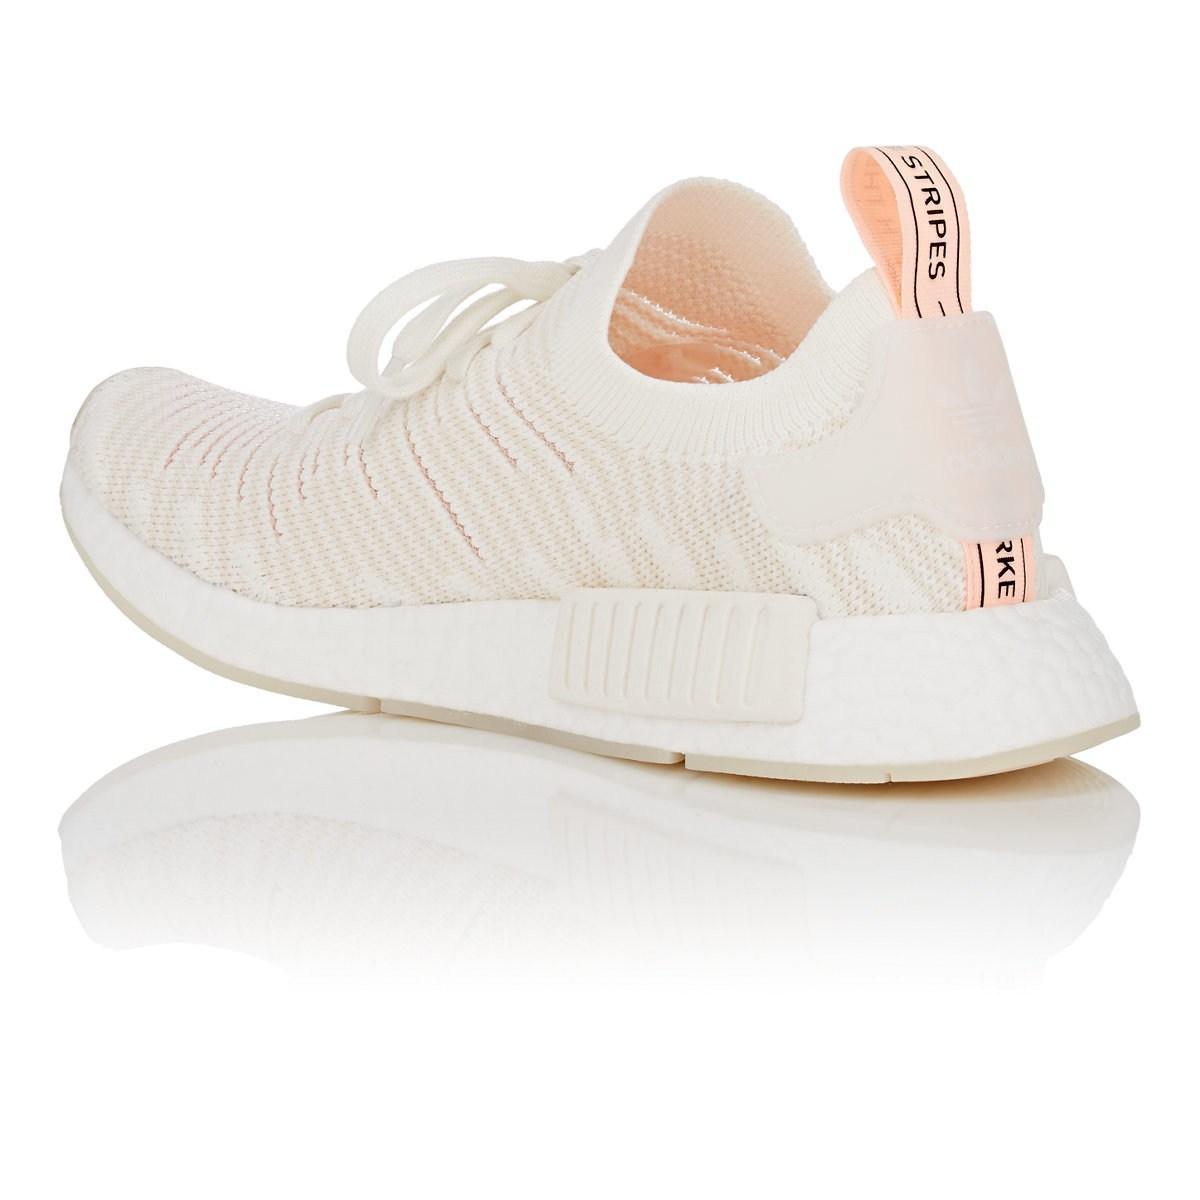 4f5b4e2ccad63 Adidas - White Nmd R1 Stlt Primeknit Sneakers - Lyst. View fullscreen